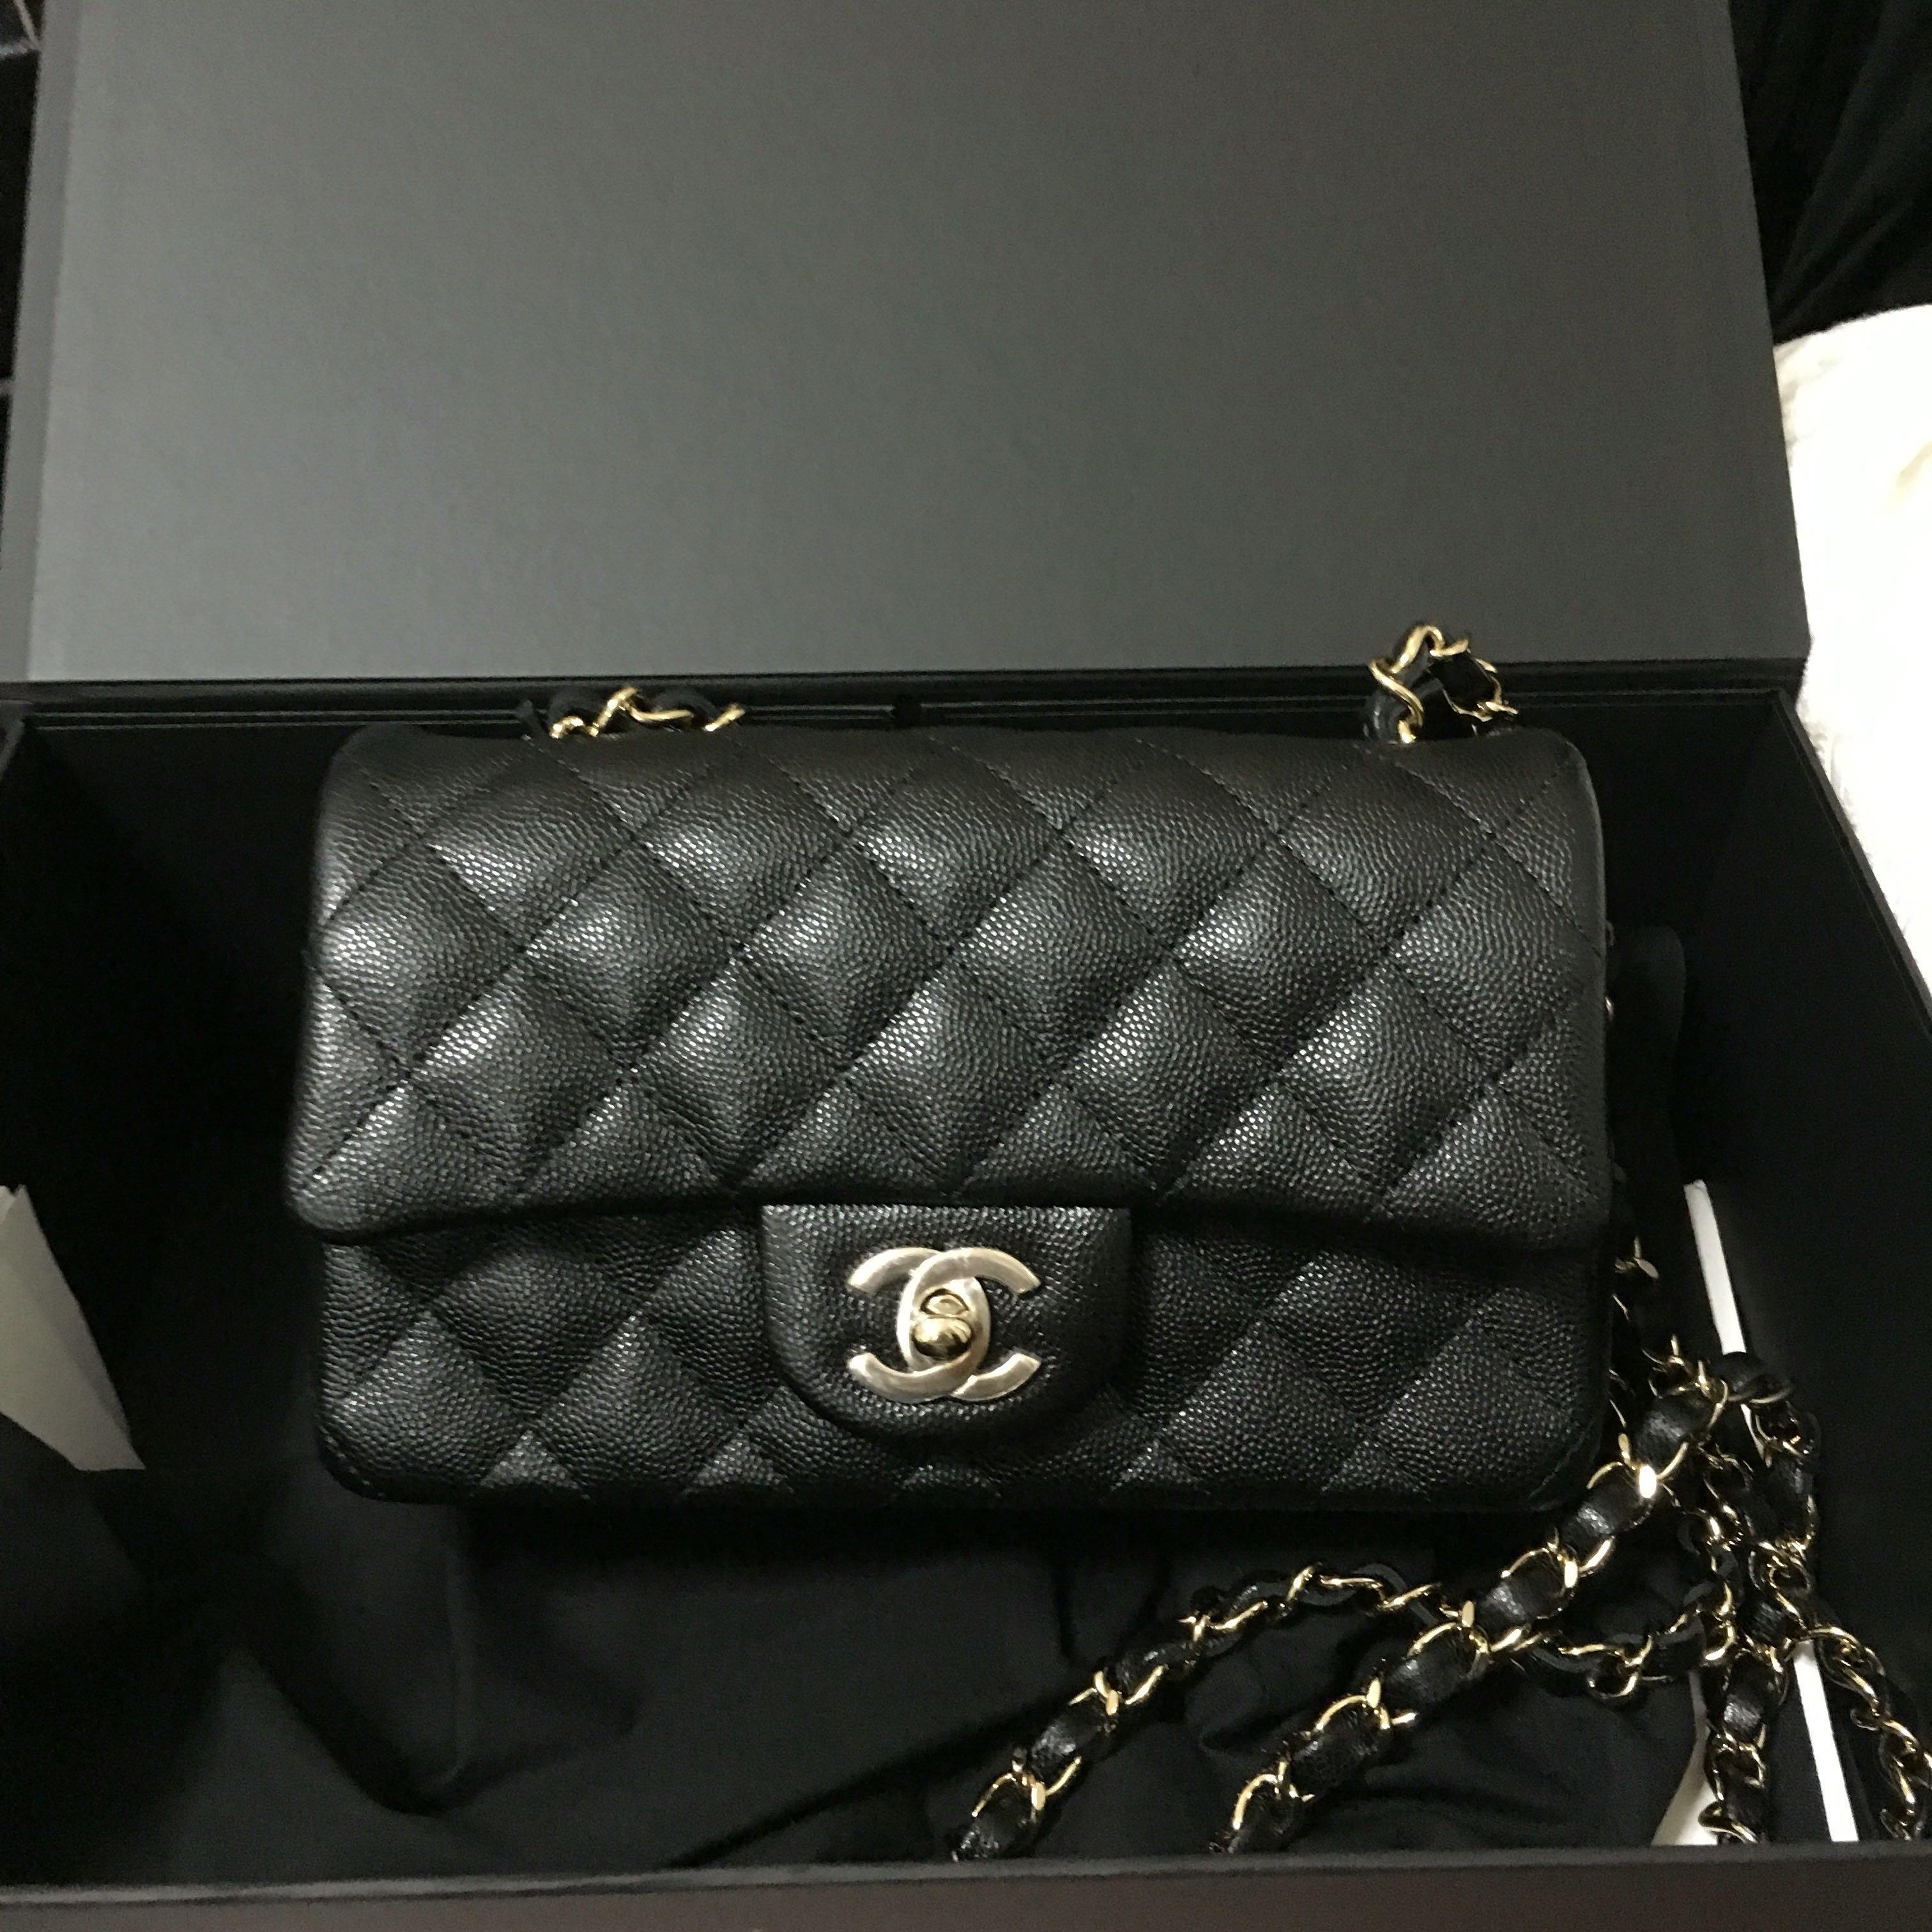 78adb7d2912c (SOLD) Chanel Mini Rectangular 18B Black Caviar Champagne GHW, Luxury, Bags  & Wallets, Handbags on Carousell